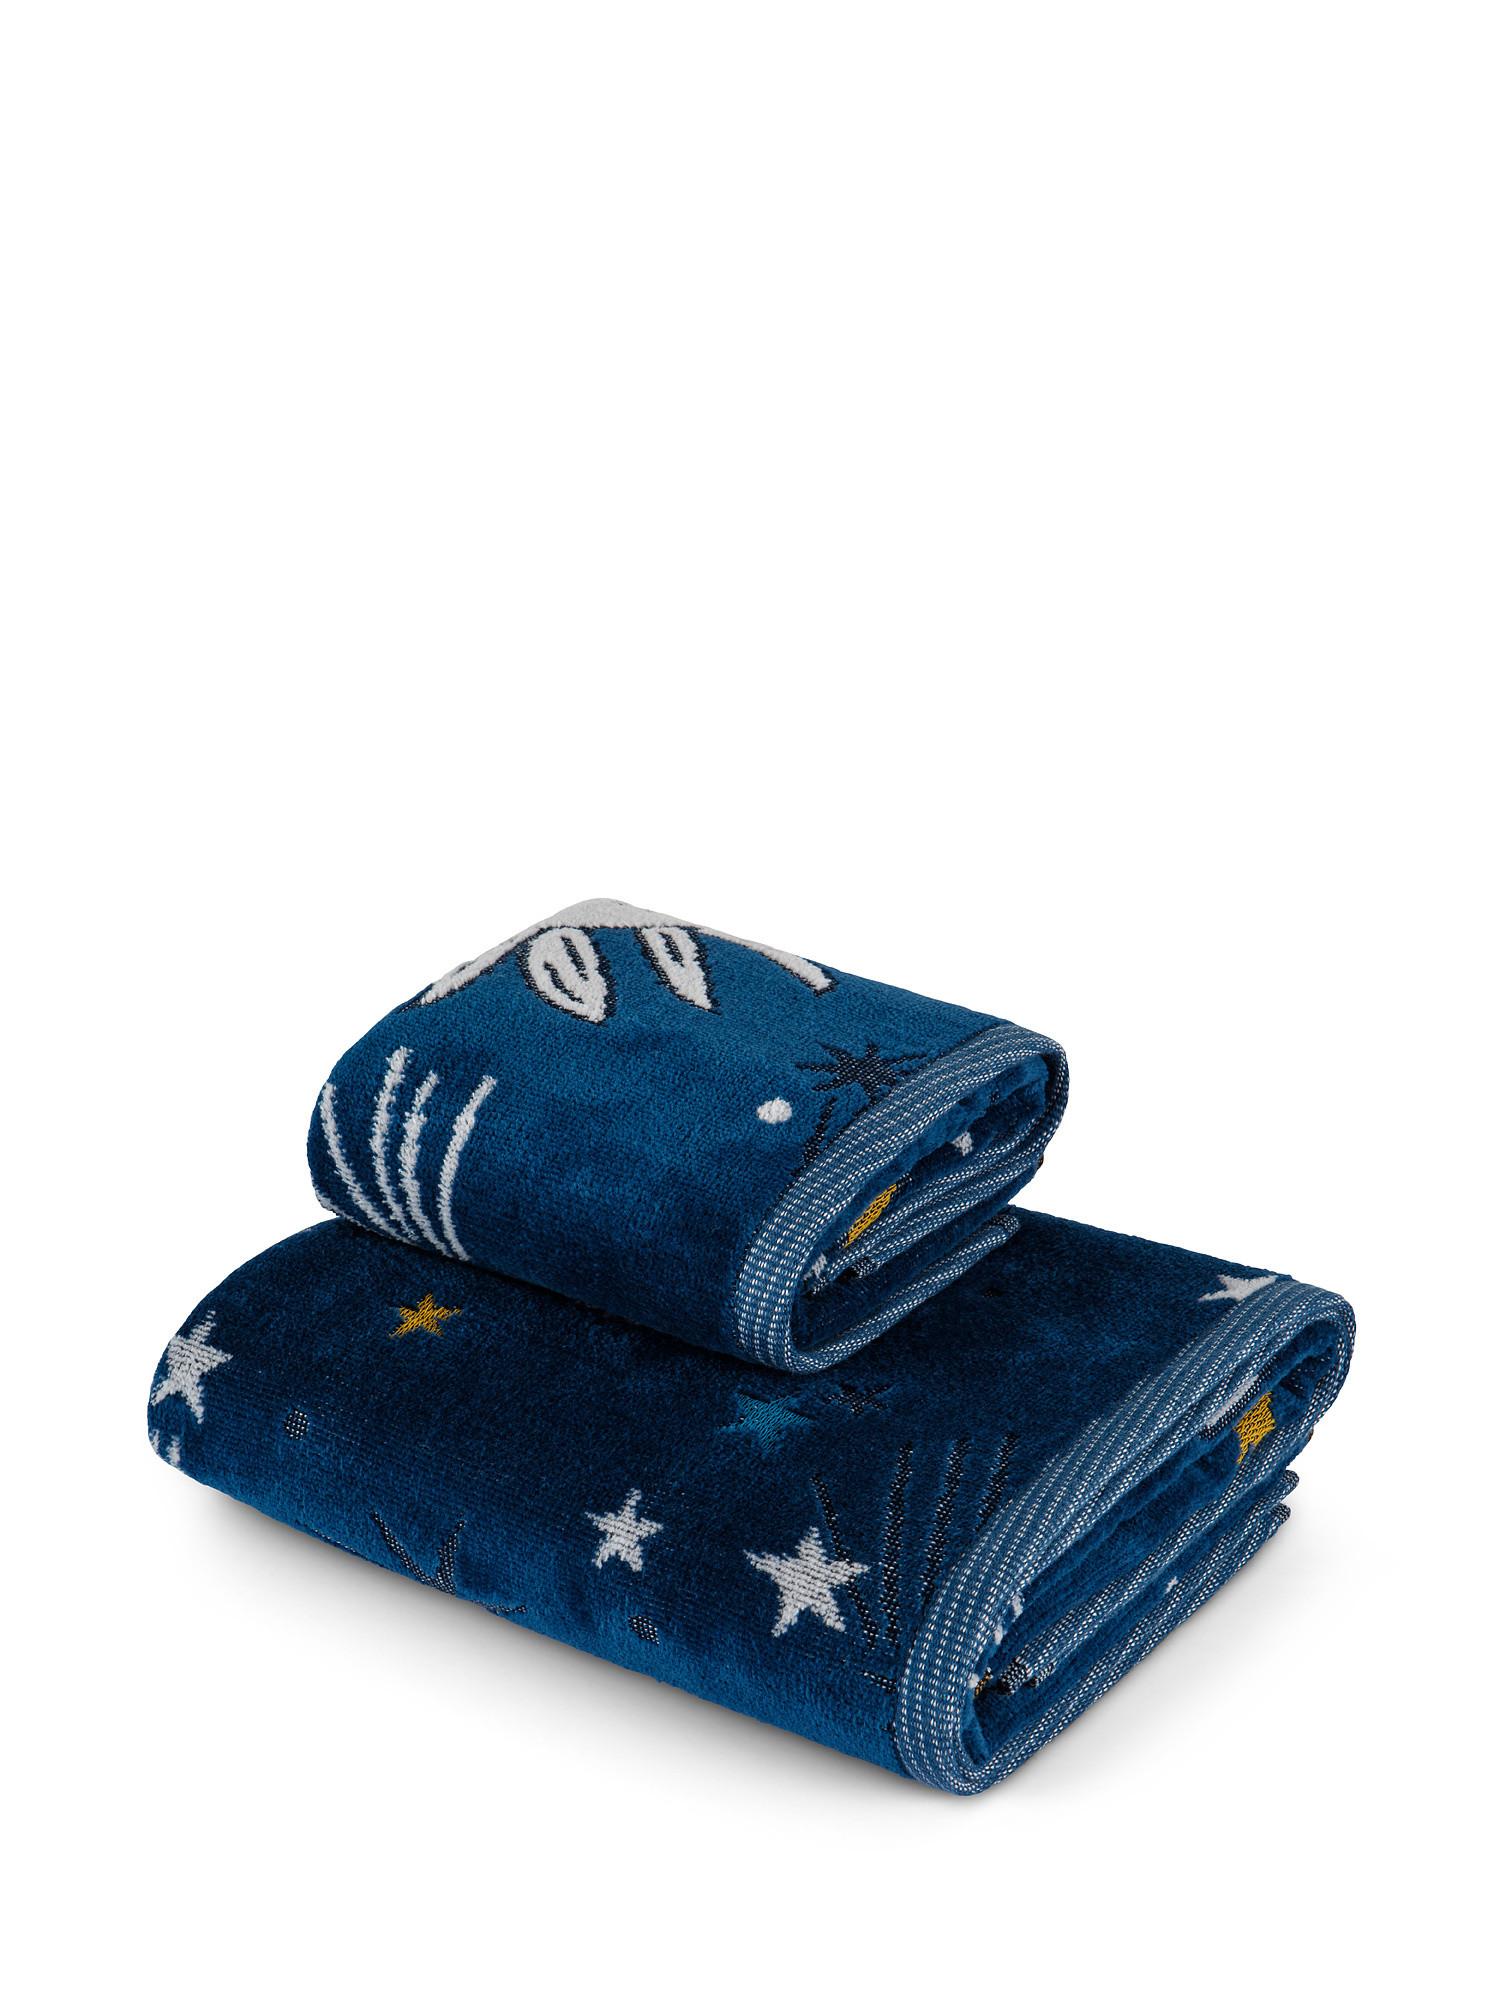 Asciugamano cotone velour motivo tarocchi, Blu, large image number 0